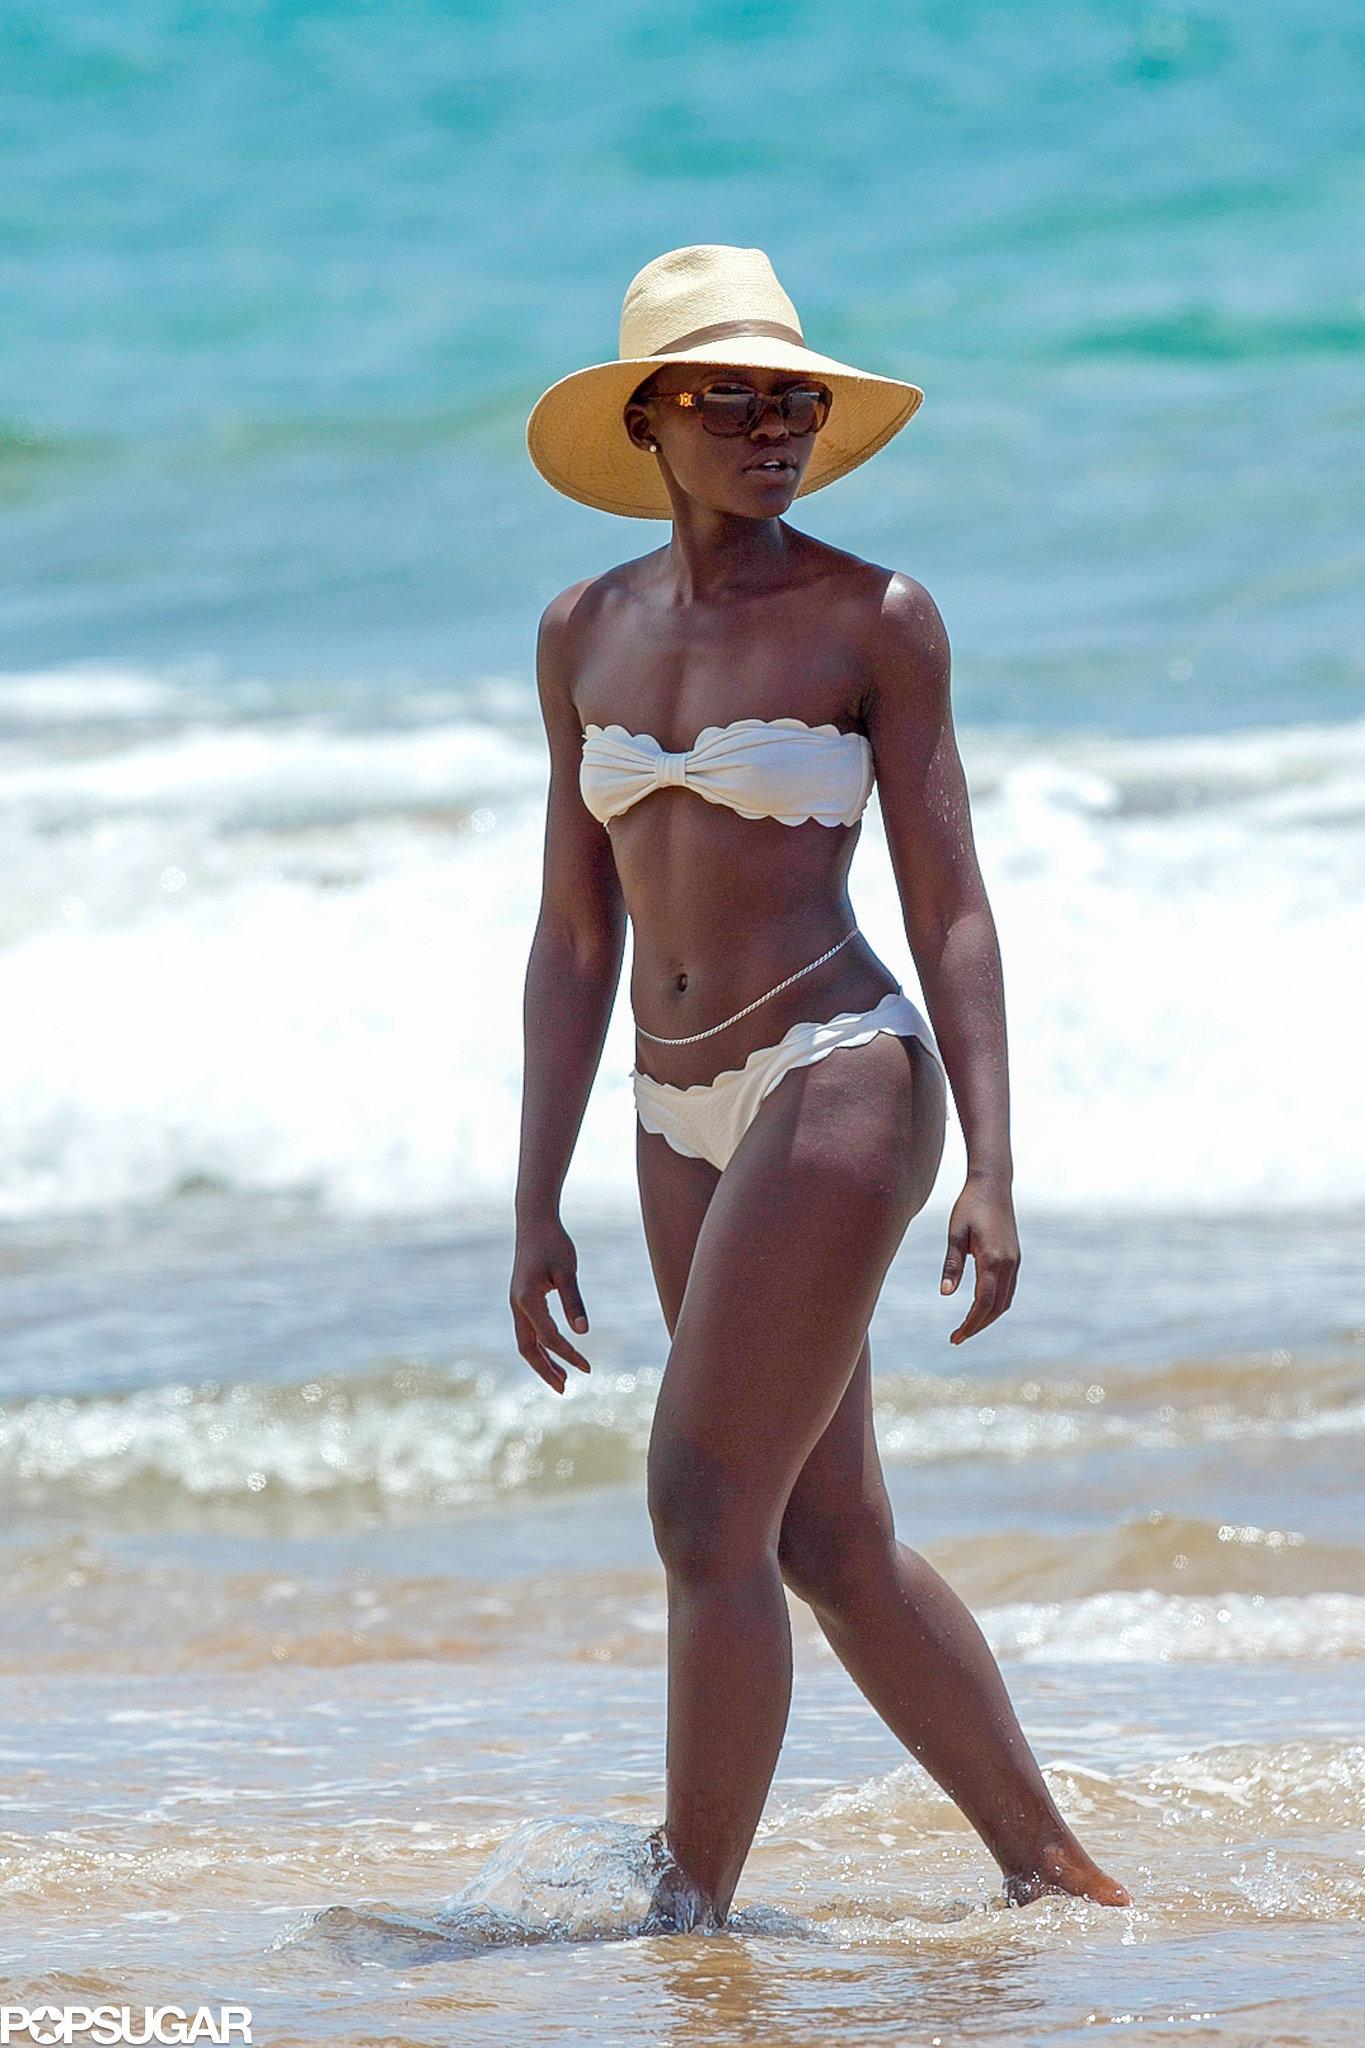 Lupita Nyong'o Shows Off Her Bikini Body in Maui!